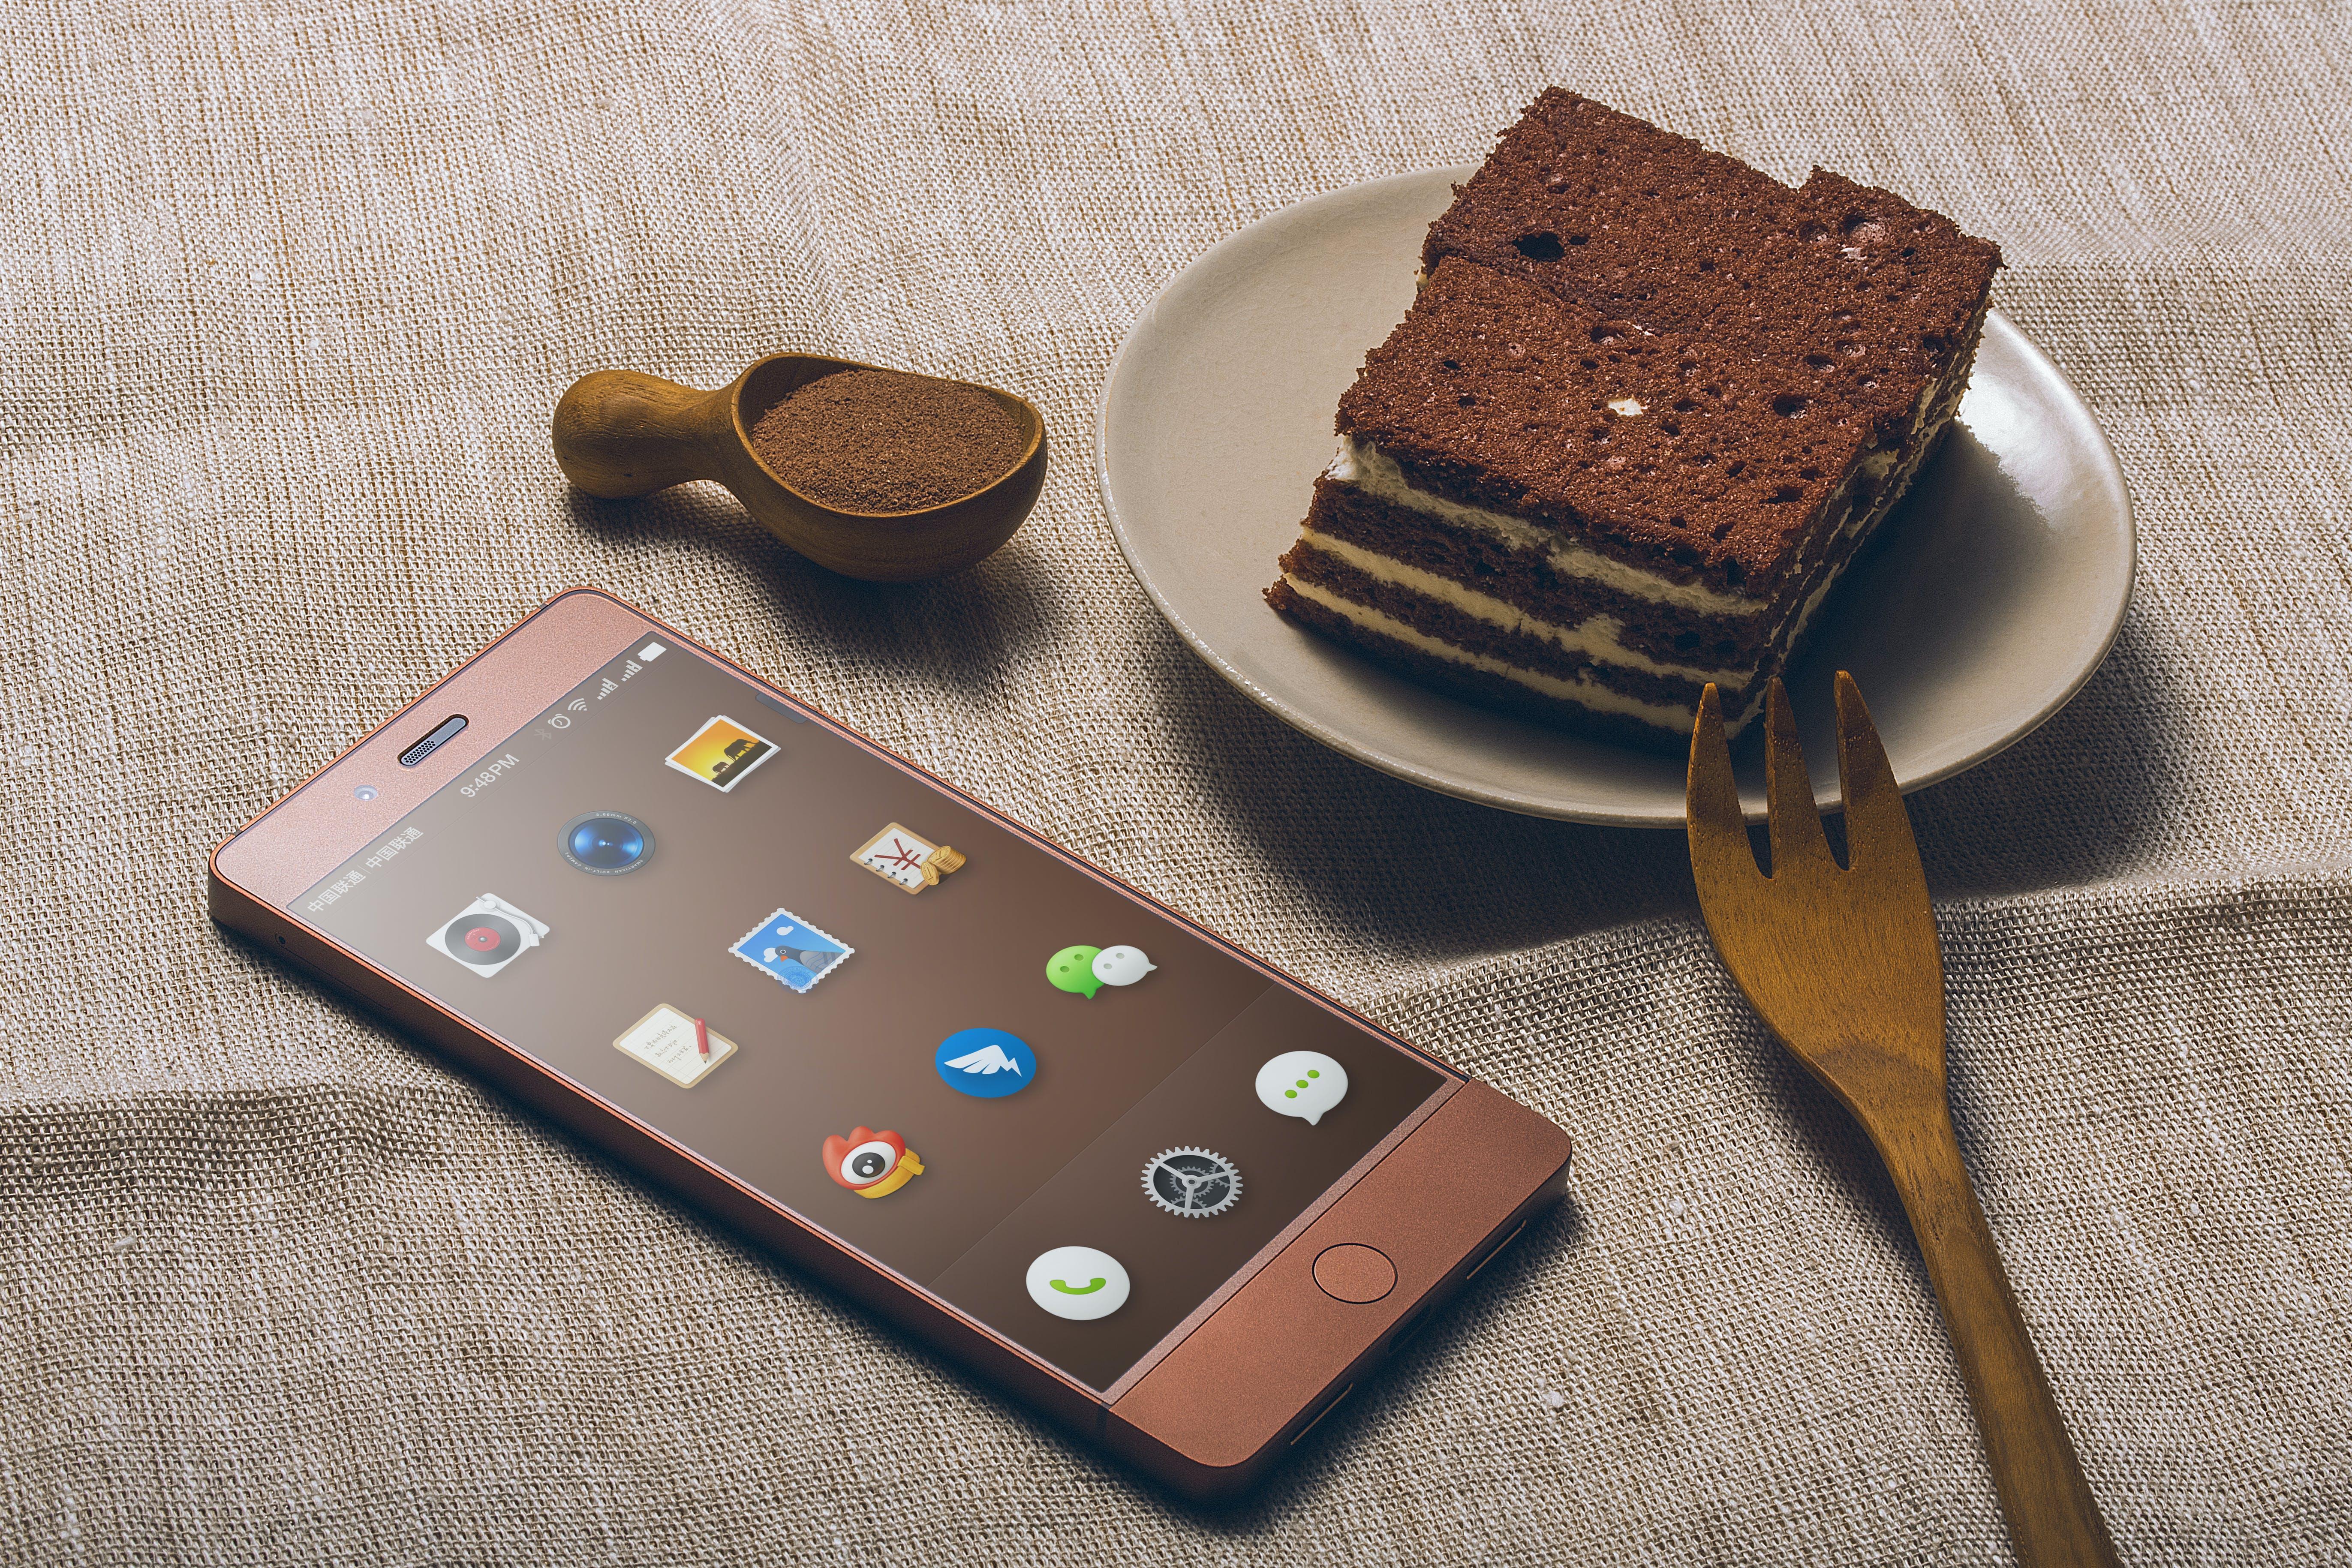 Chocolate Cake on Saucer Beside Iphone